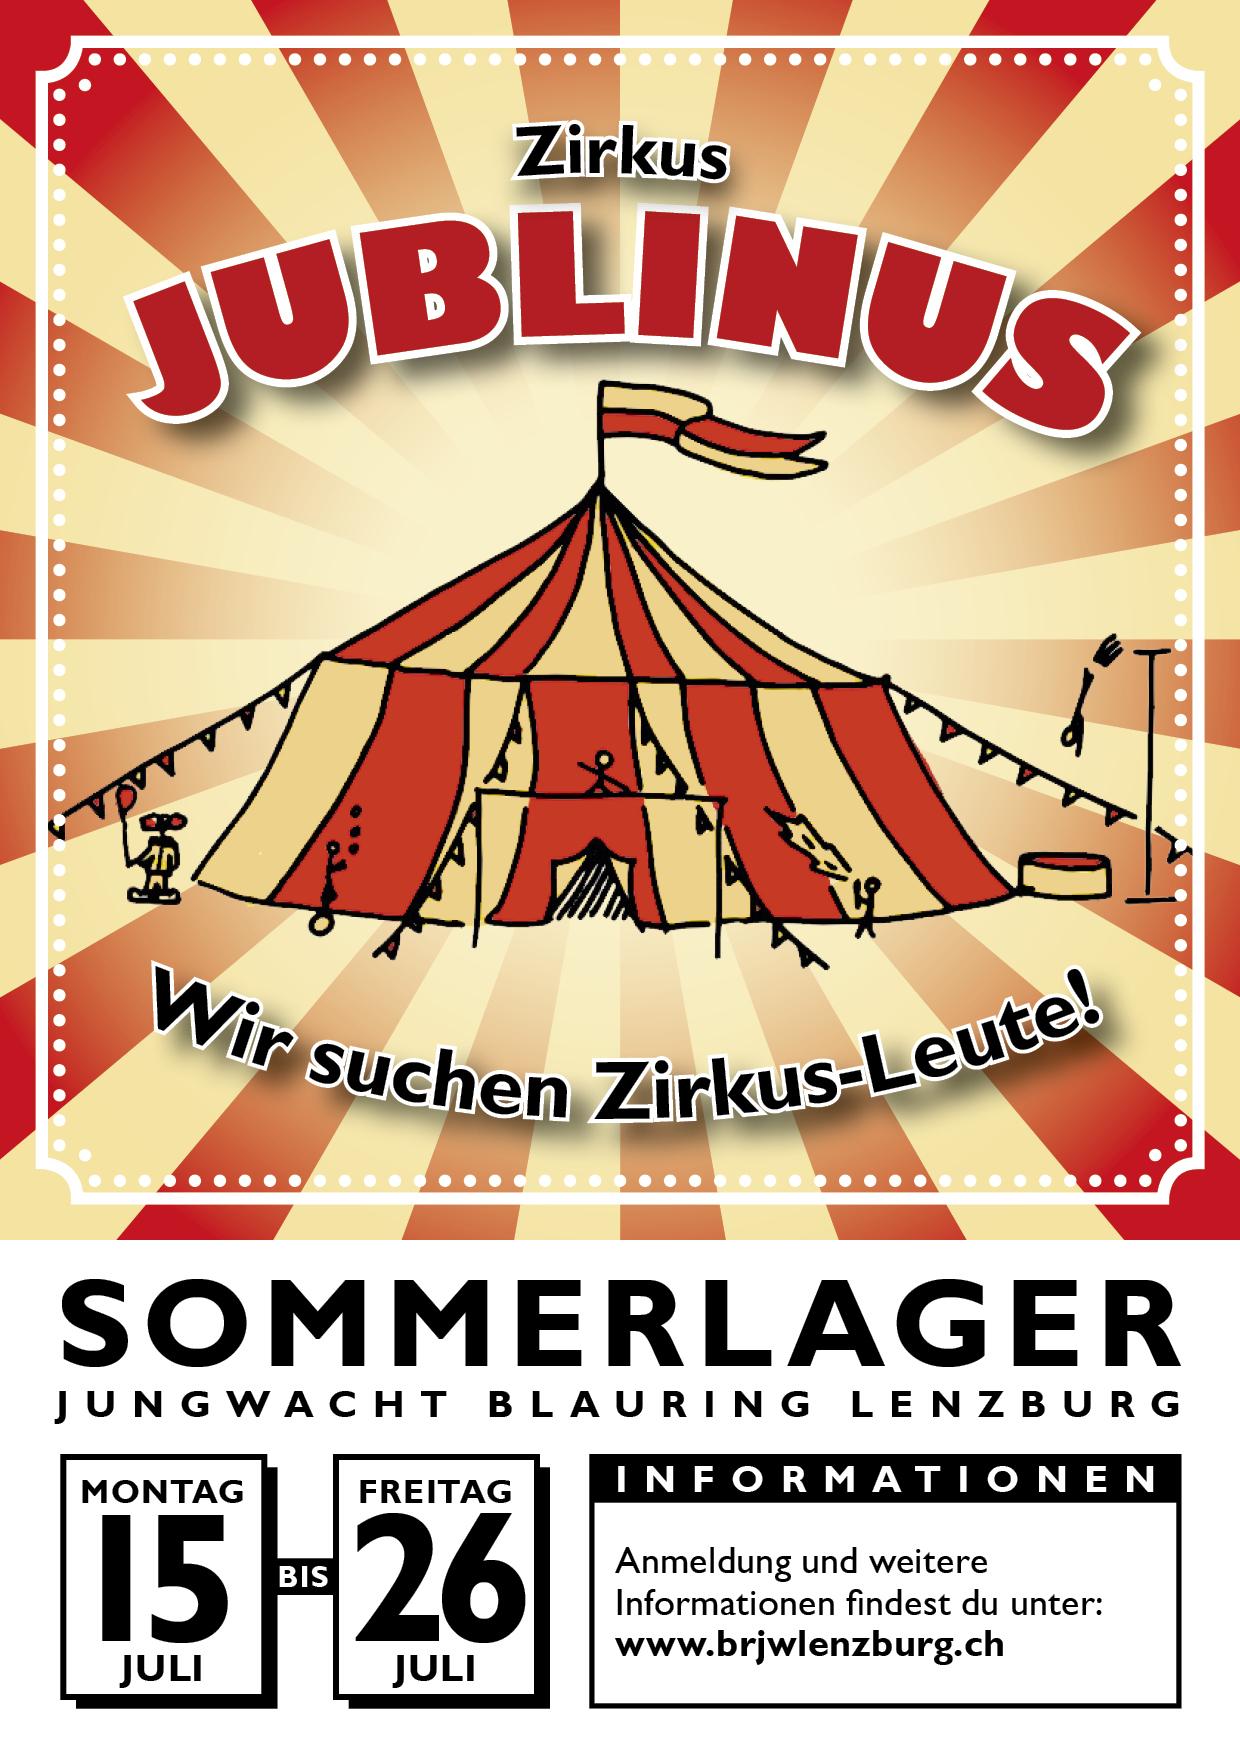 Flyer_Sola2019_Zirkus_Jublinus.jpg